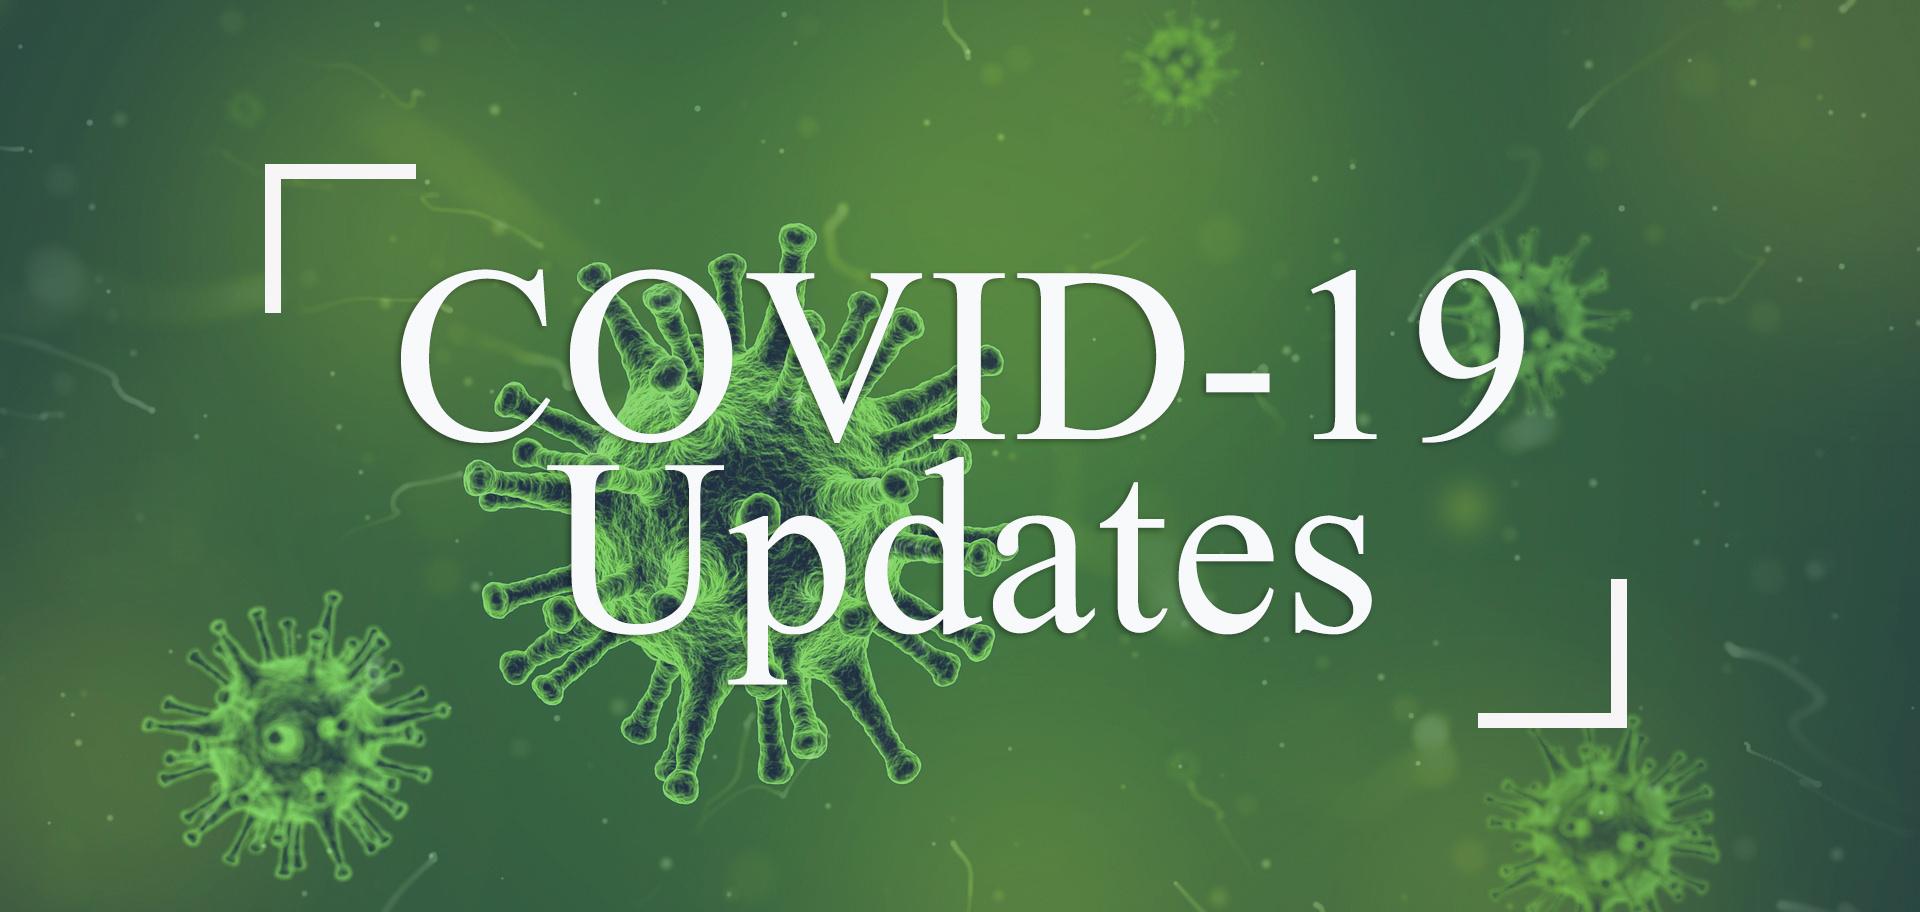 Brazil reports more than 11 million COVID-19 cases